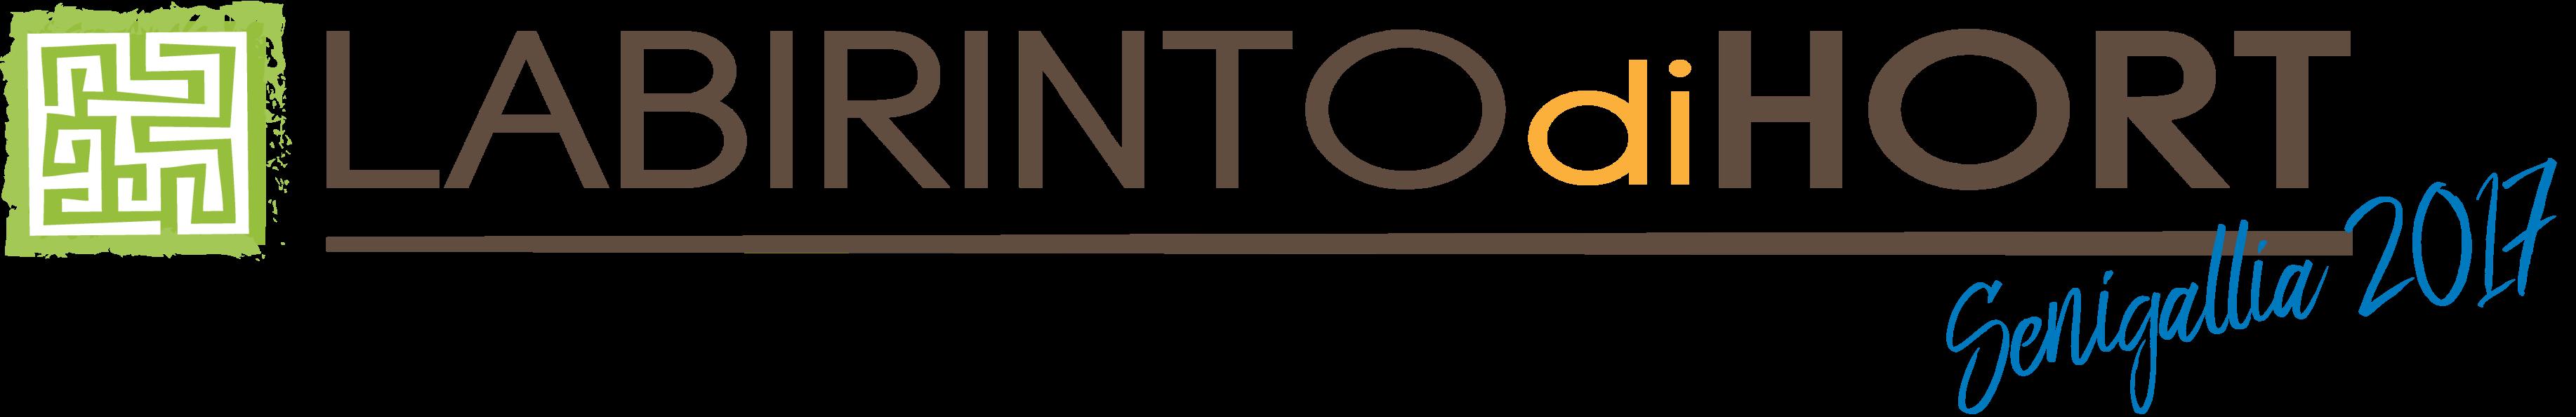 labirinto hort logo 2017